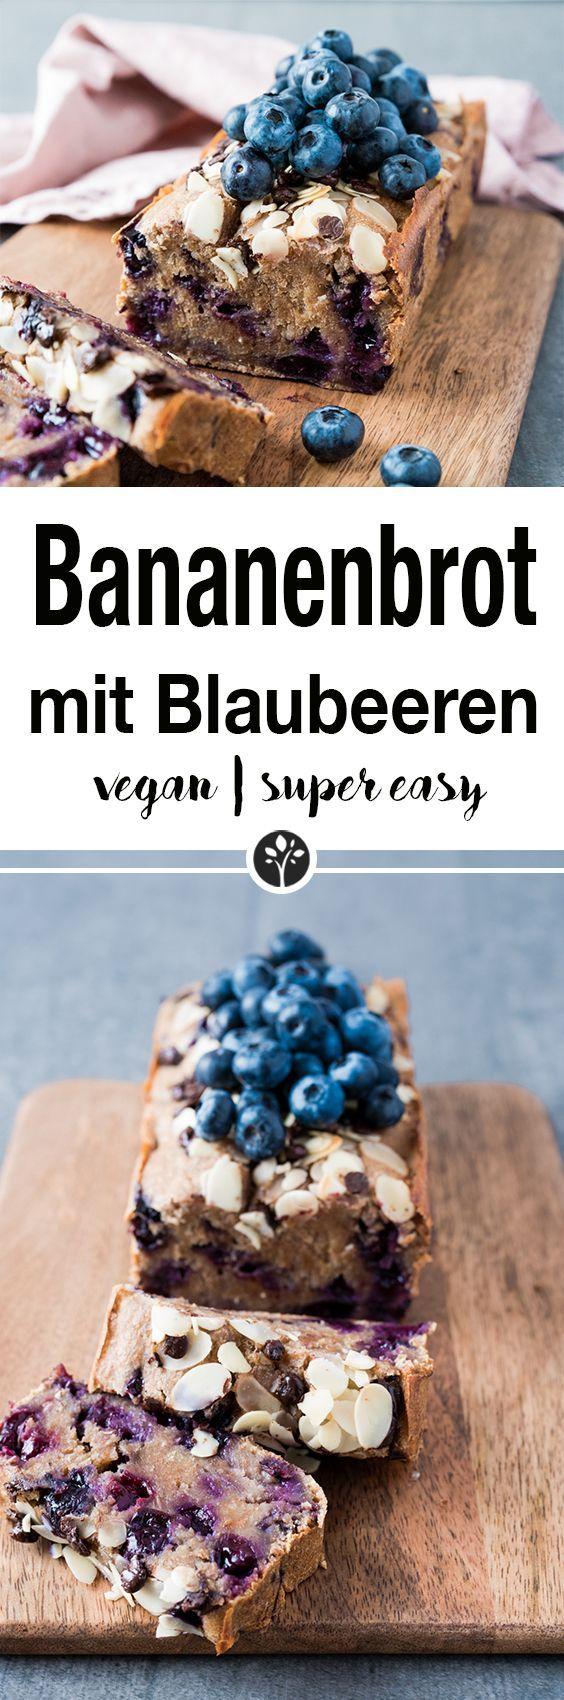 Bananenbrot mit Blaubeeren